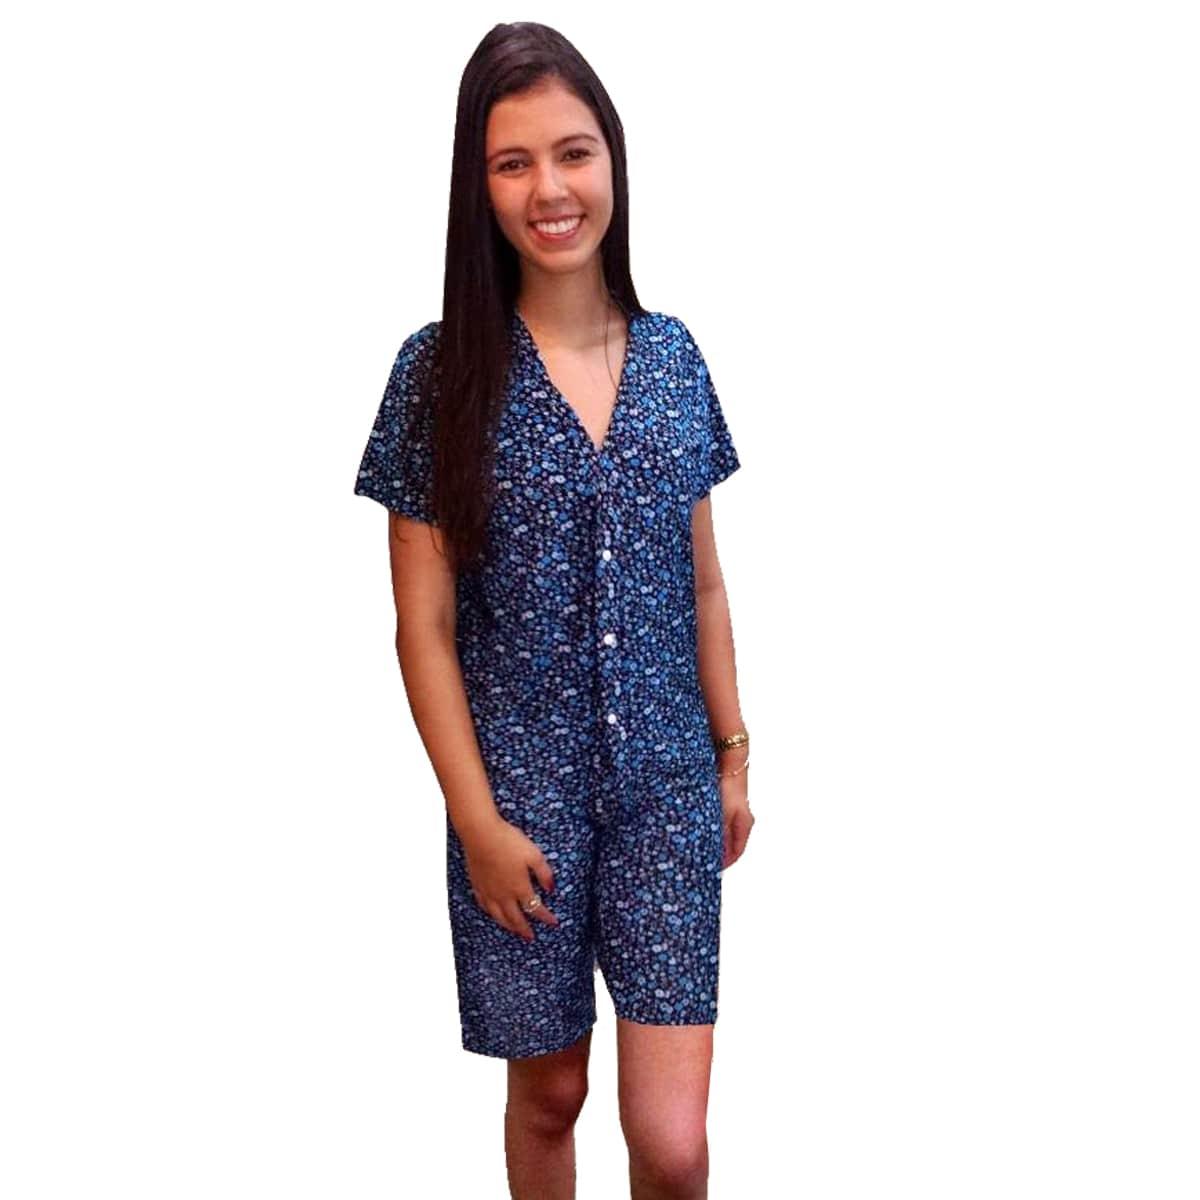 Pijama Pescador Manga Curta Aberto Bermuda Liganete Adulto Estampado Ref: 7001